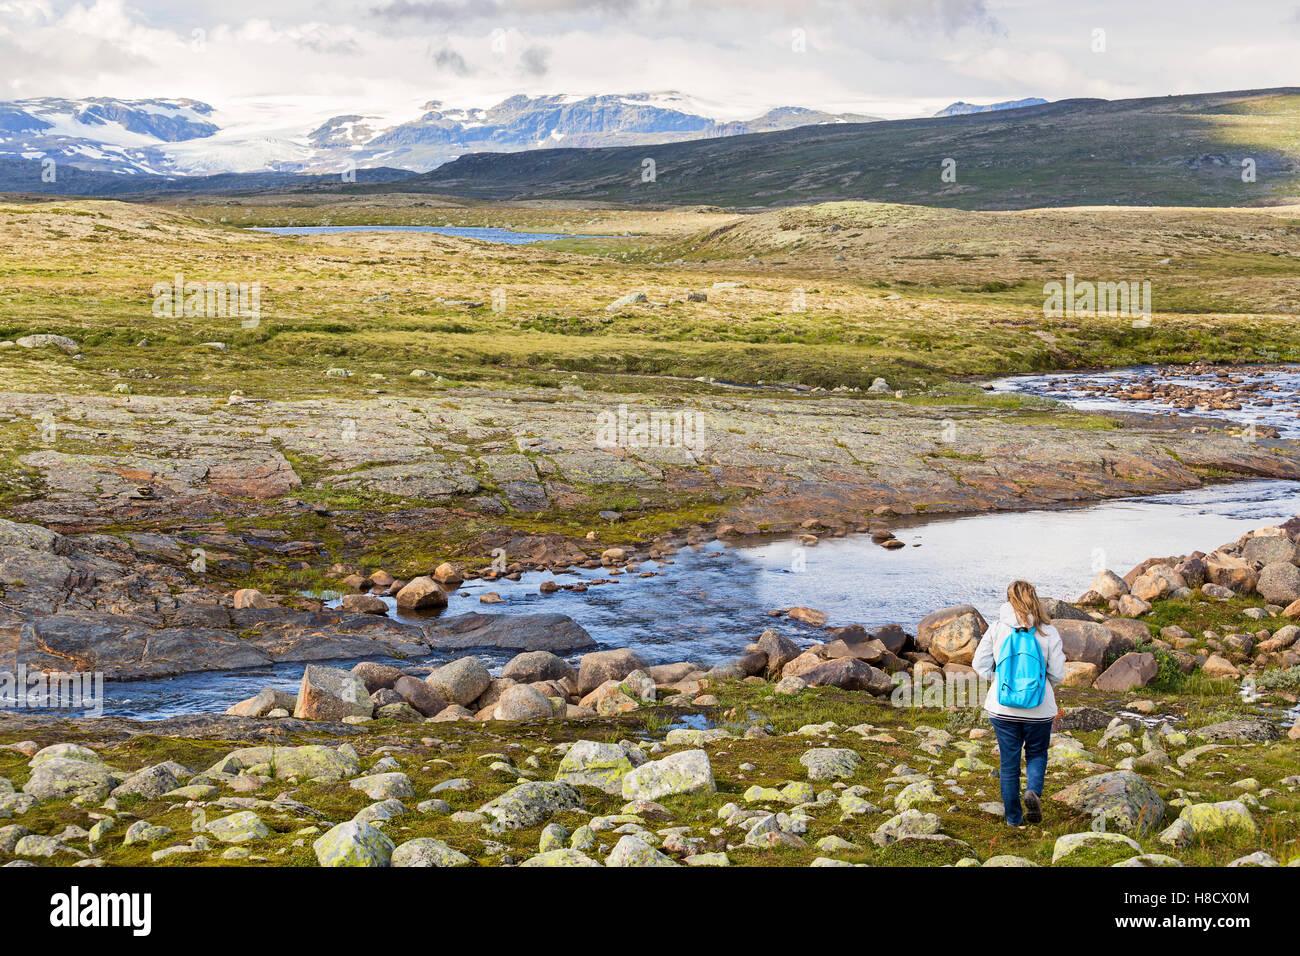 Woman looking at the Hardangervidda National Park landscape - Stock Image